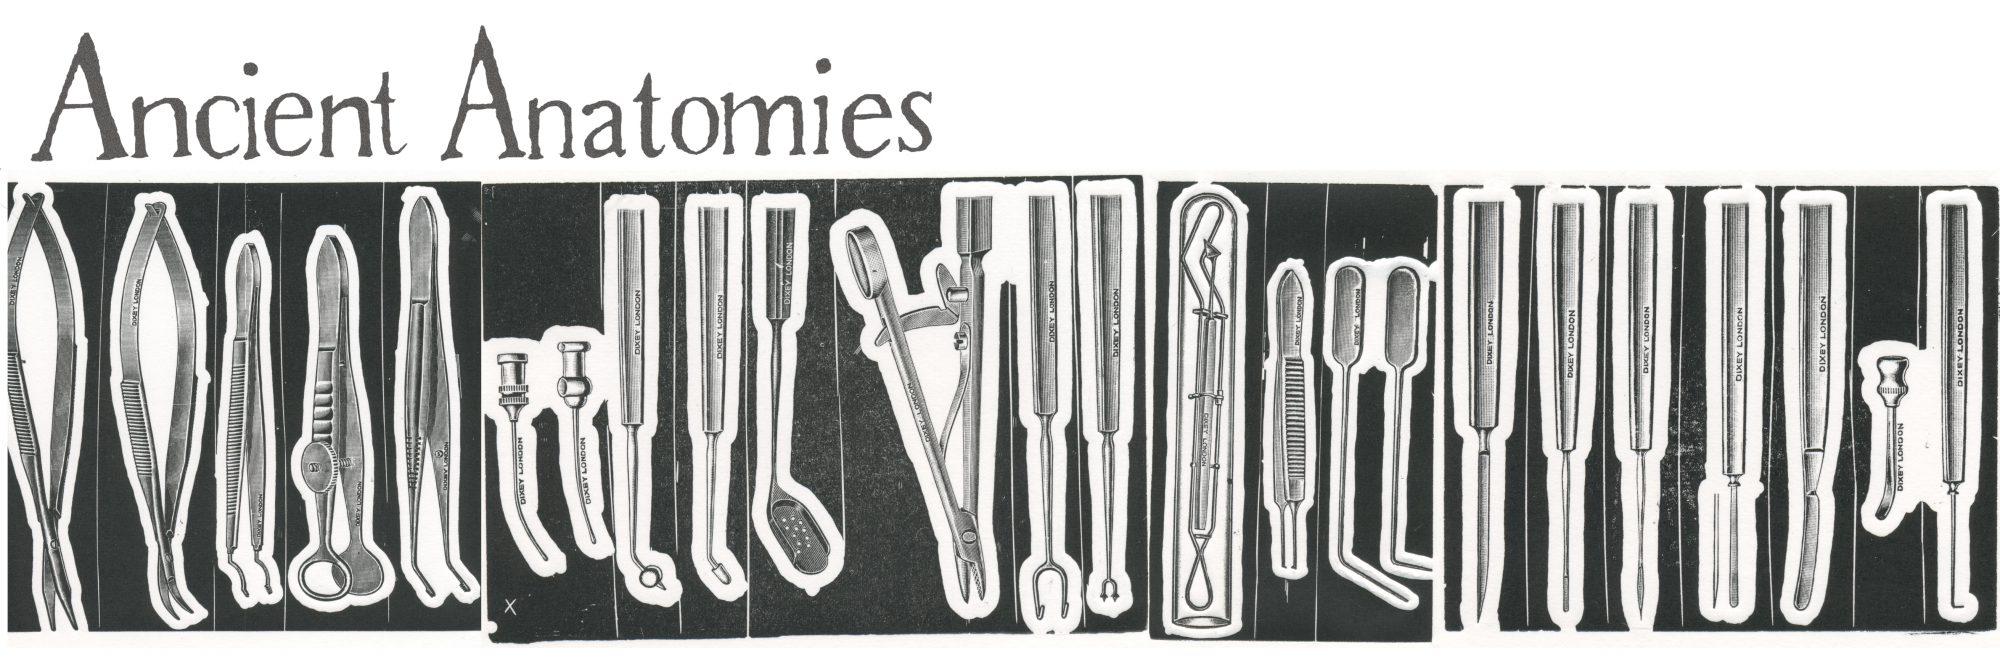 https://ancientanatomies.files.wordpress.com/2017/10/cropped-tester-title-4.jpg